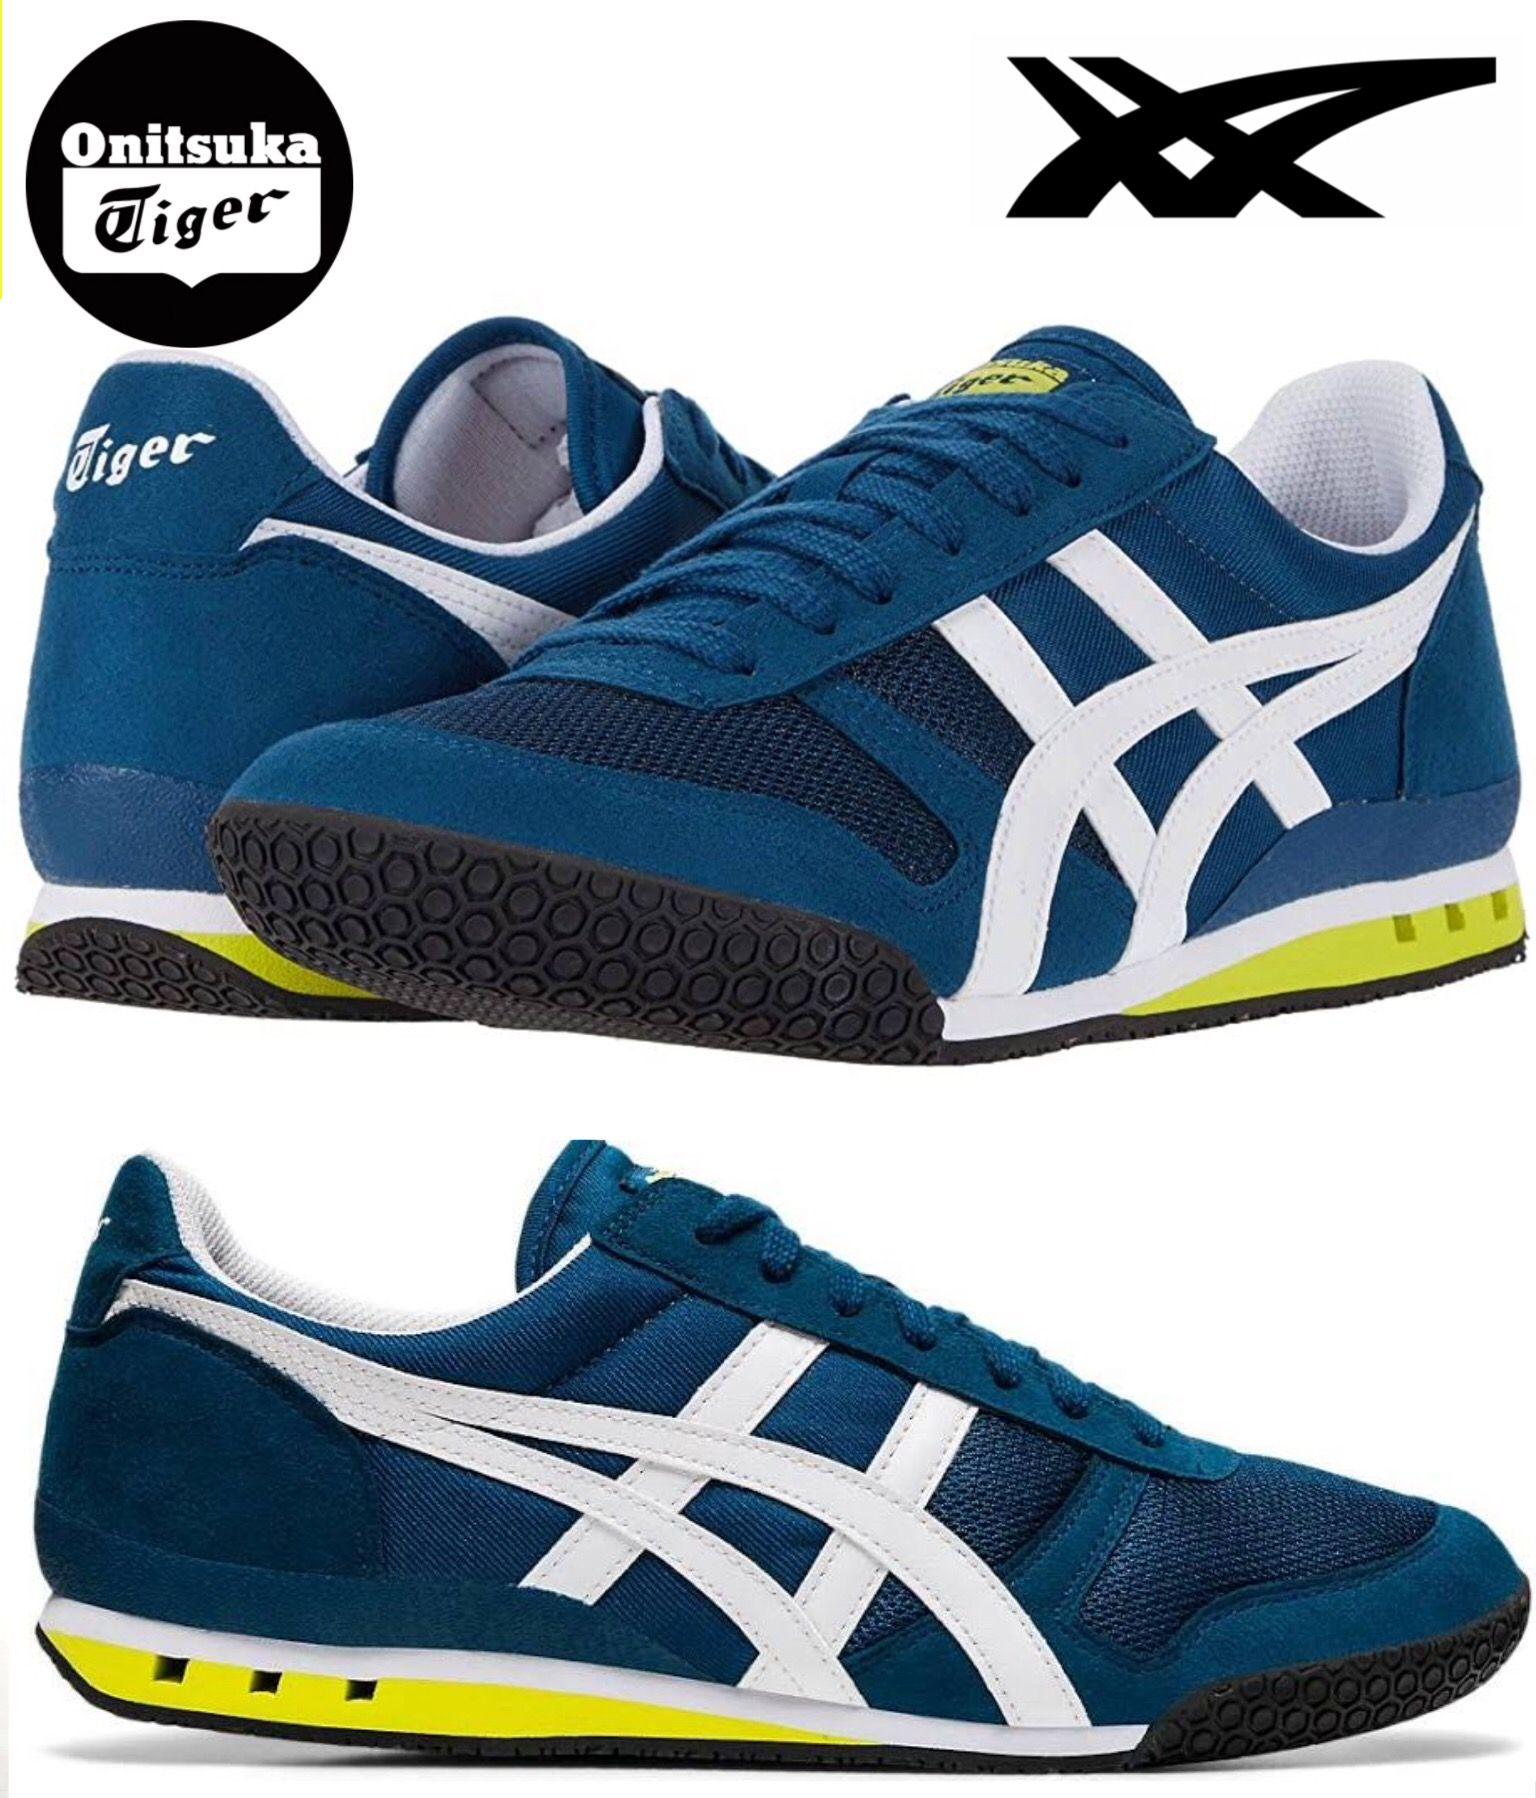 Asics sneaker, Sport shoes, Onitsuka tiger